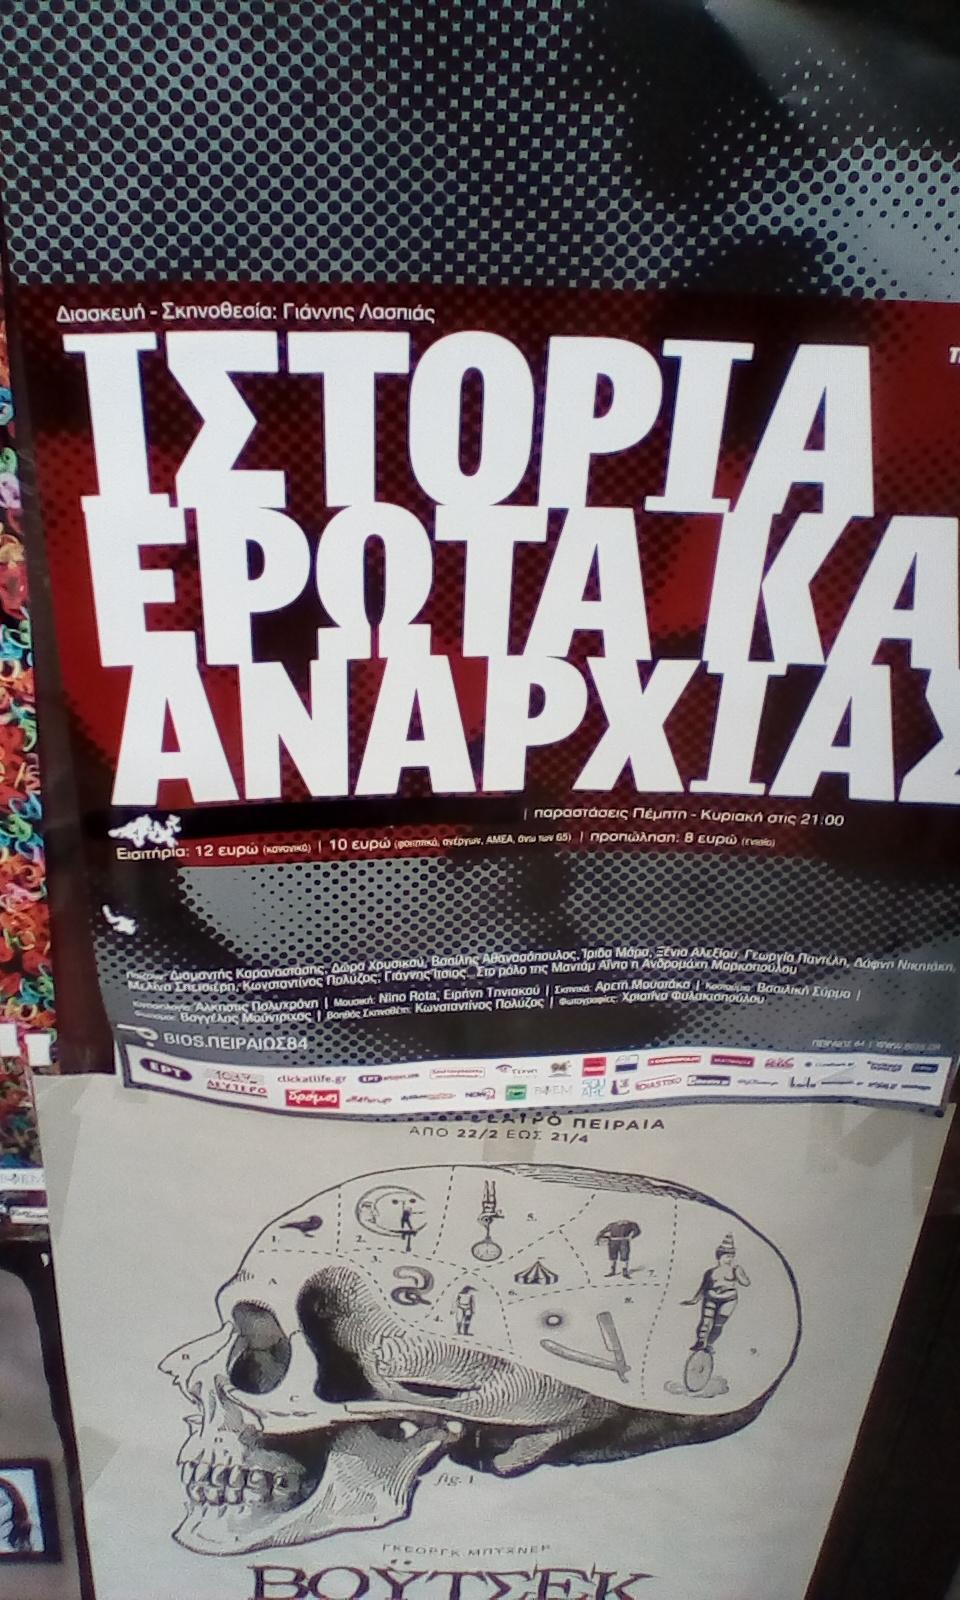 Bios theatre march 19 Athens